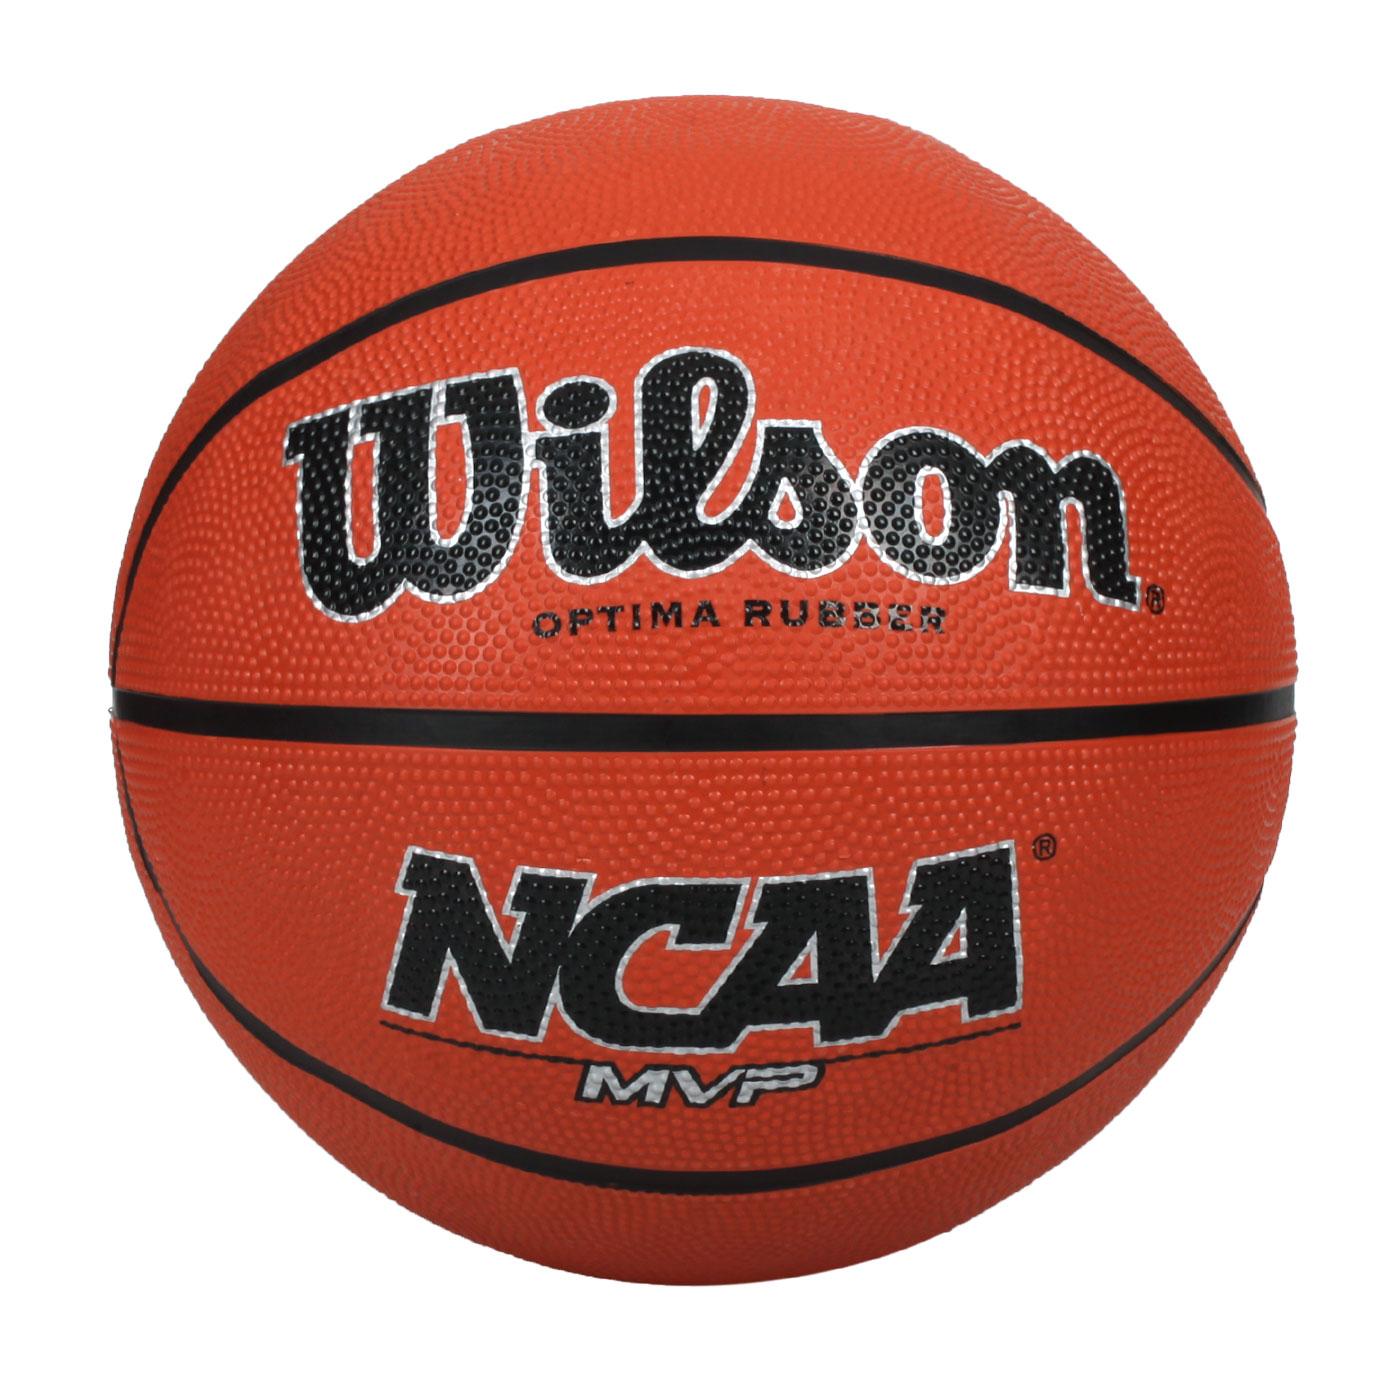 WILSON NCAA MVP 橡膠籃球#7 WTB0760XDEF - 橘黑銀